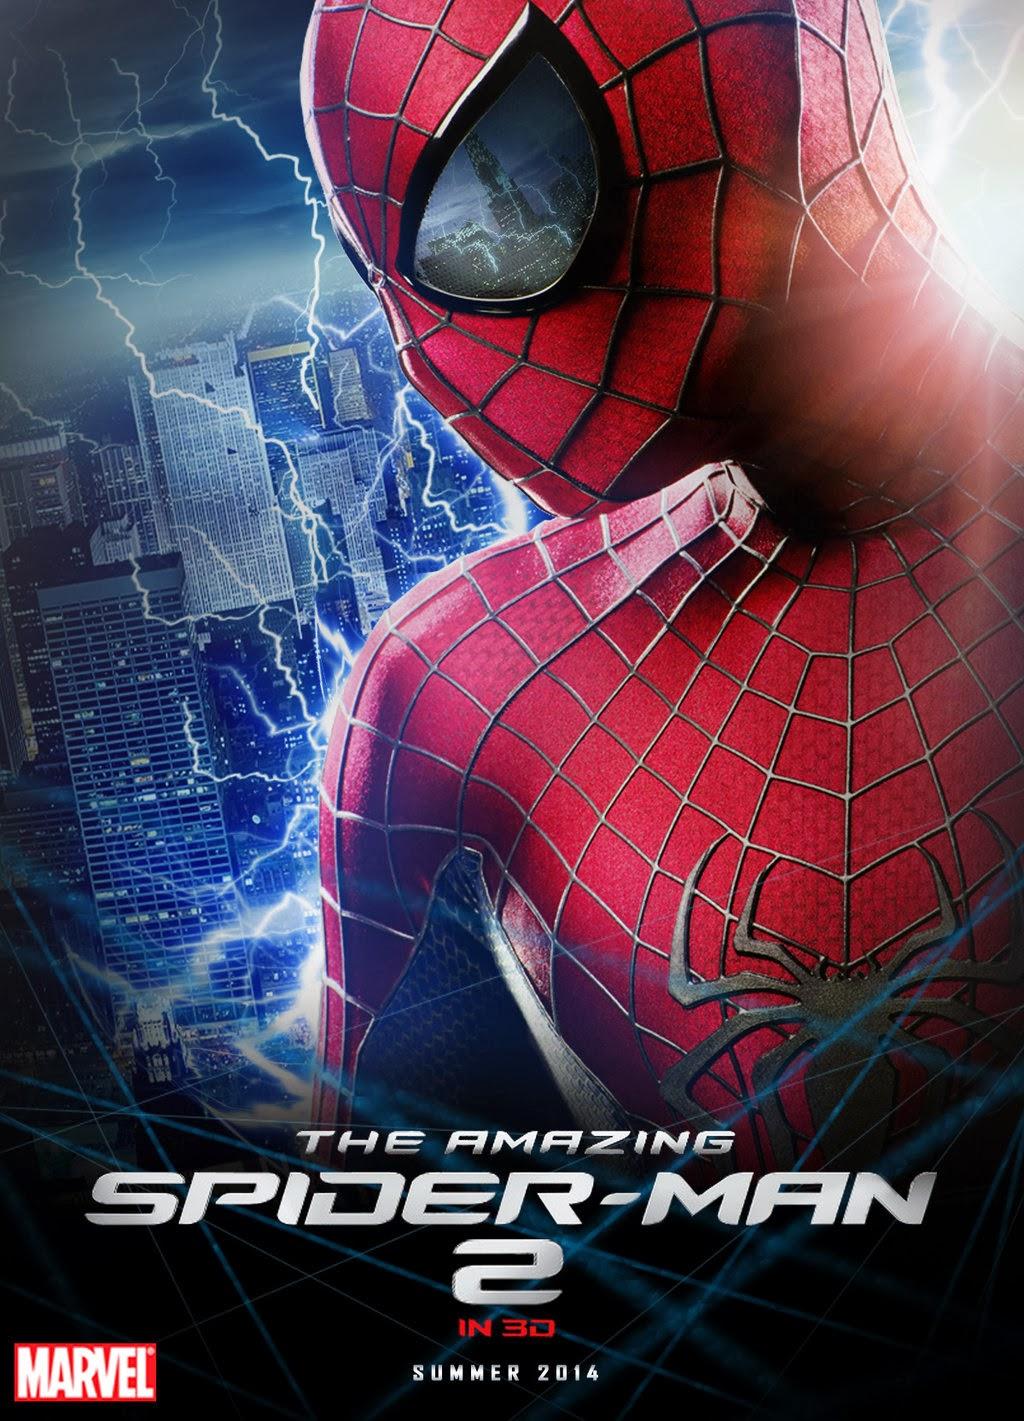 THE AMAZING SPIDER-MAN 2: NUEVO AVANCE SUBTITULADO